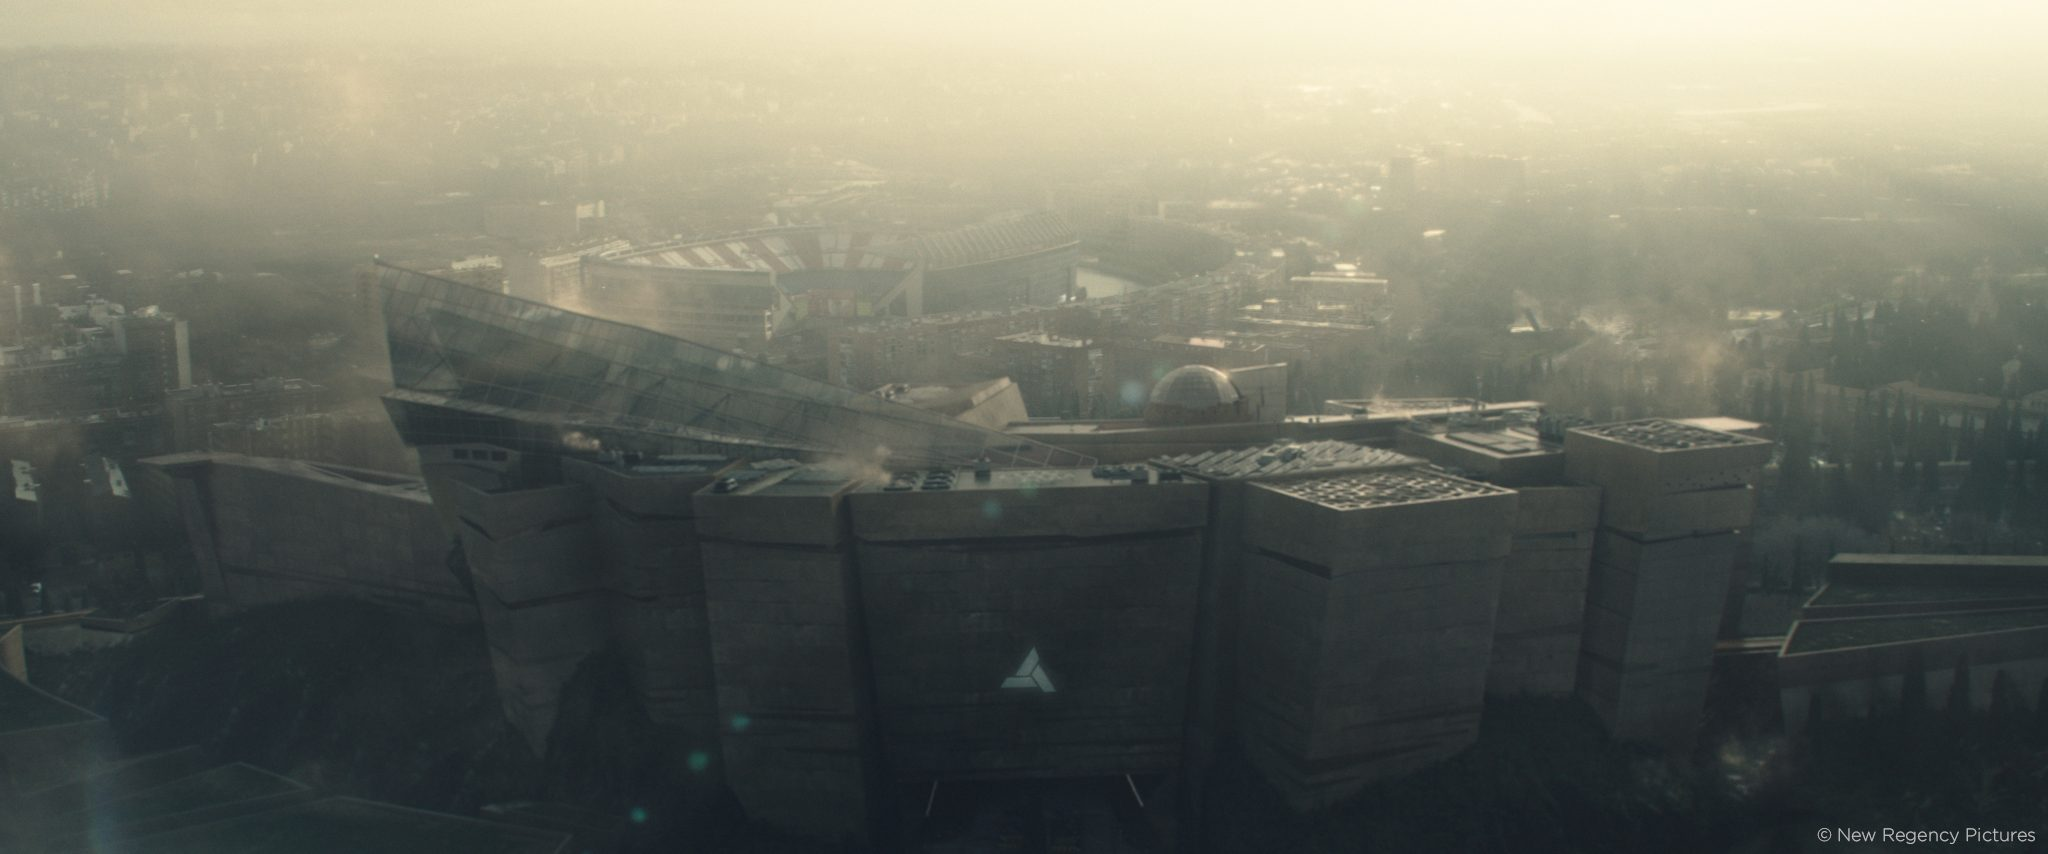 assassins-creed-asbergo-fortress